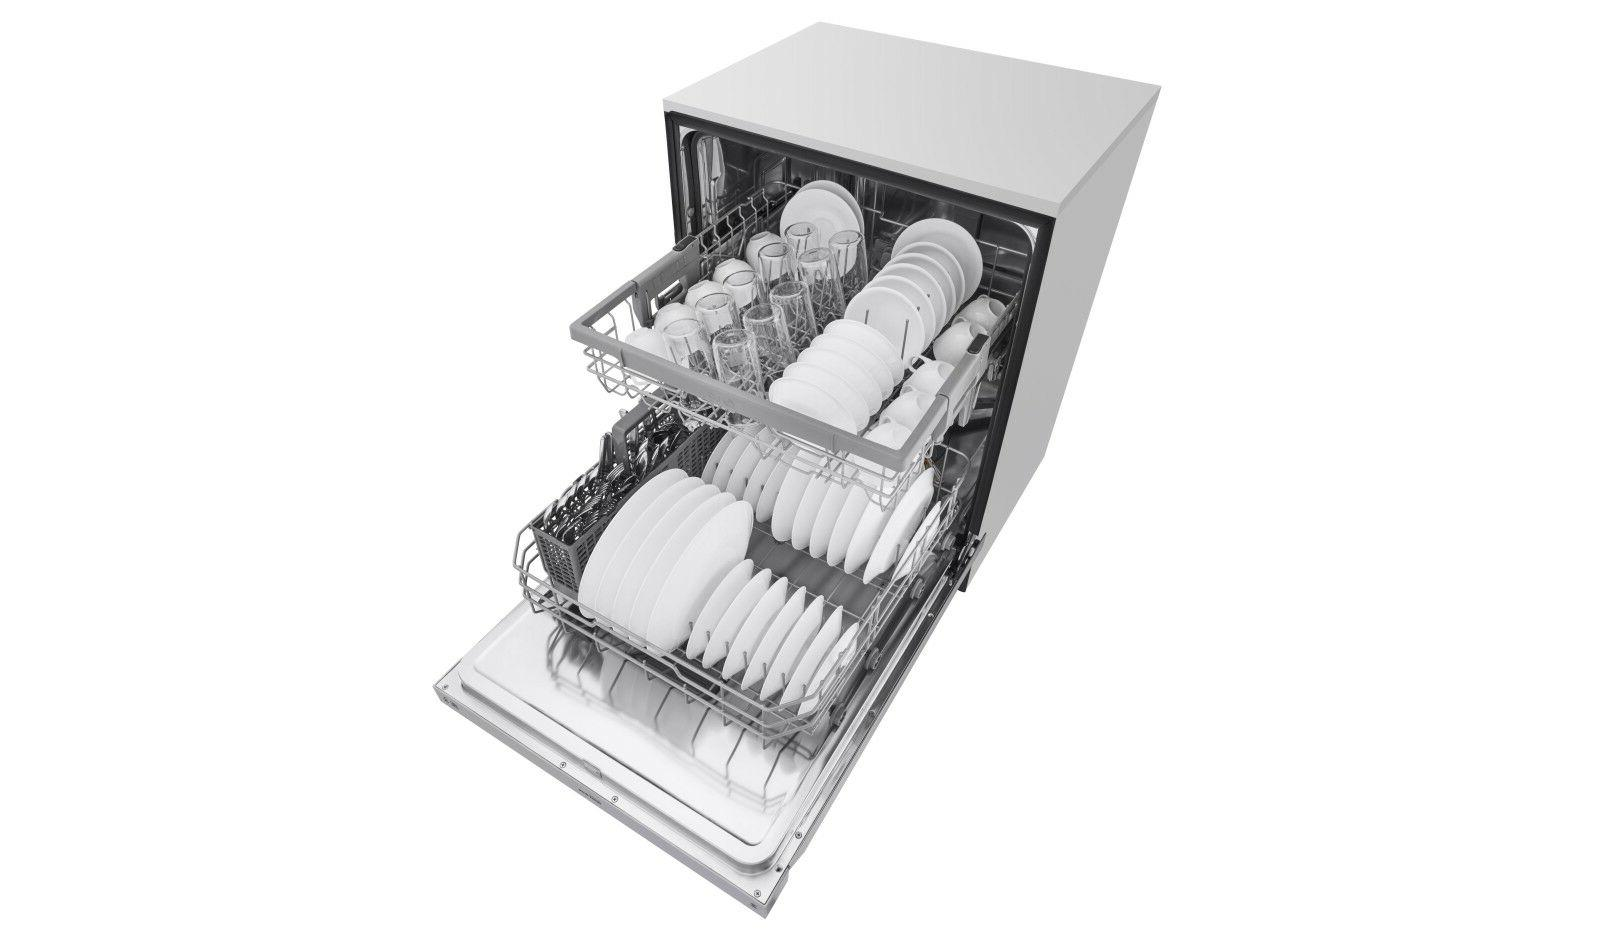 LG Dishwasher w/QuadWash & Plus/NEW